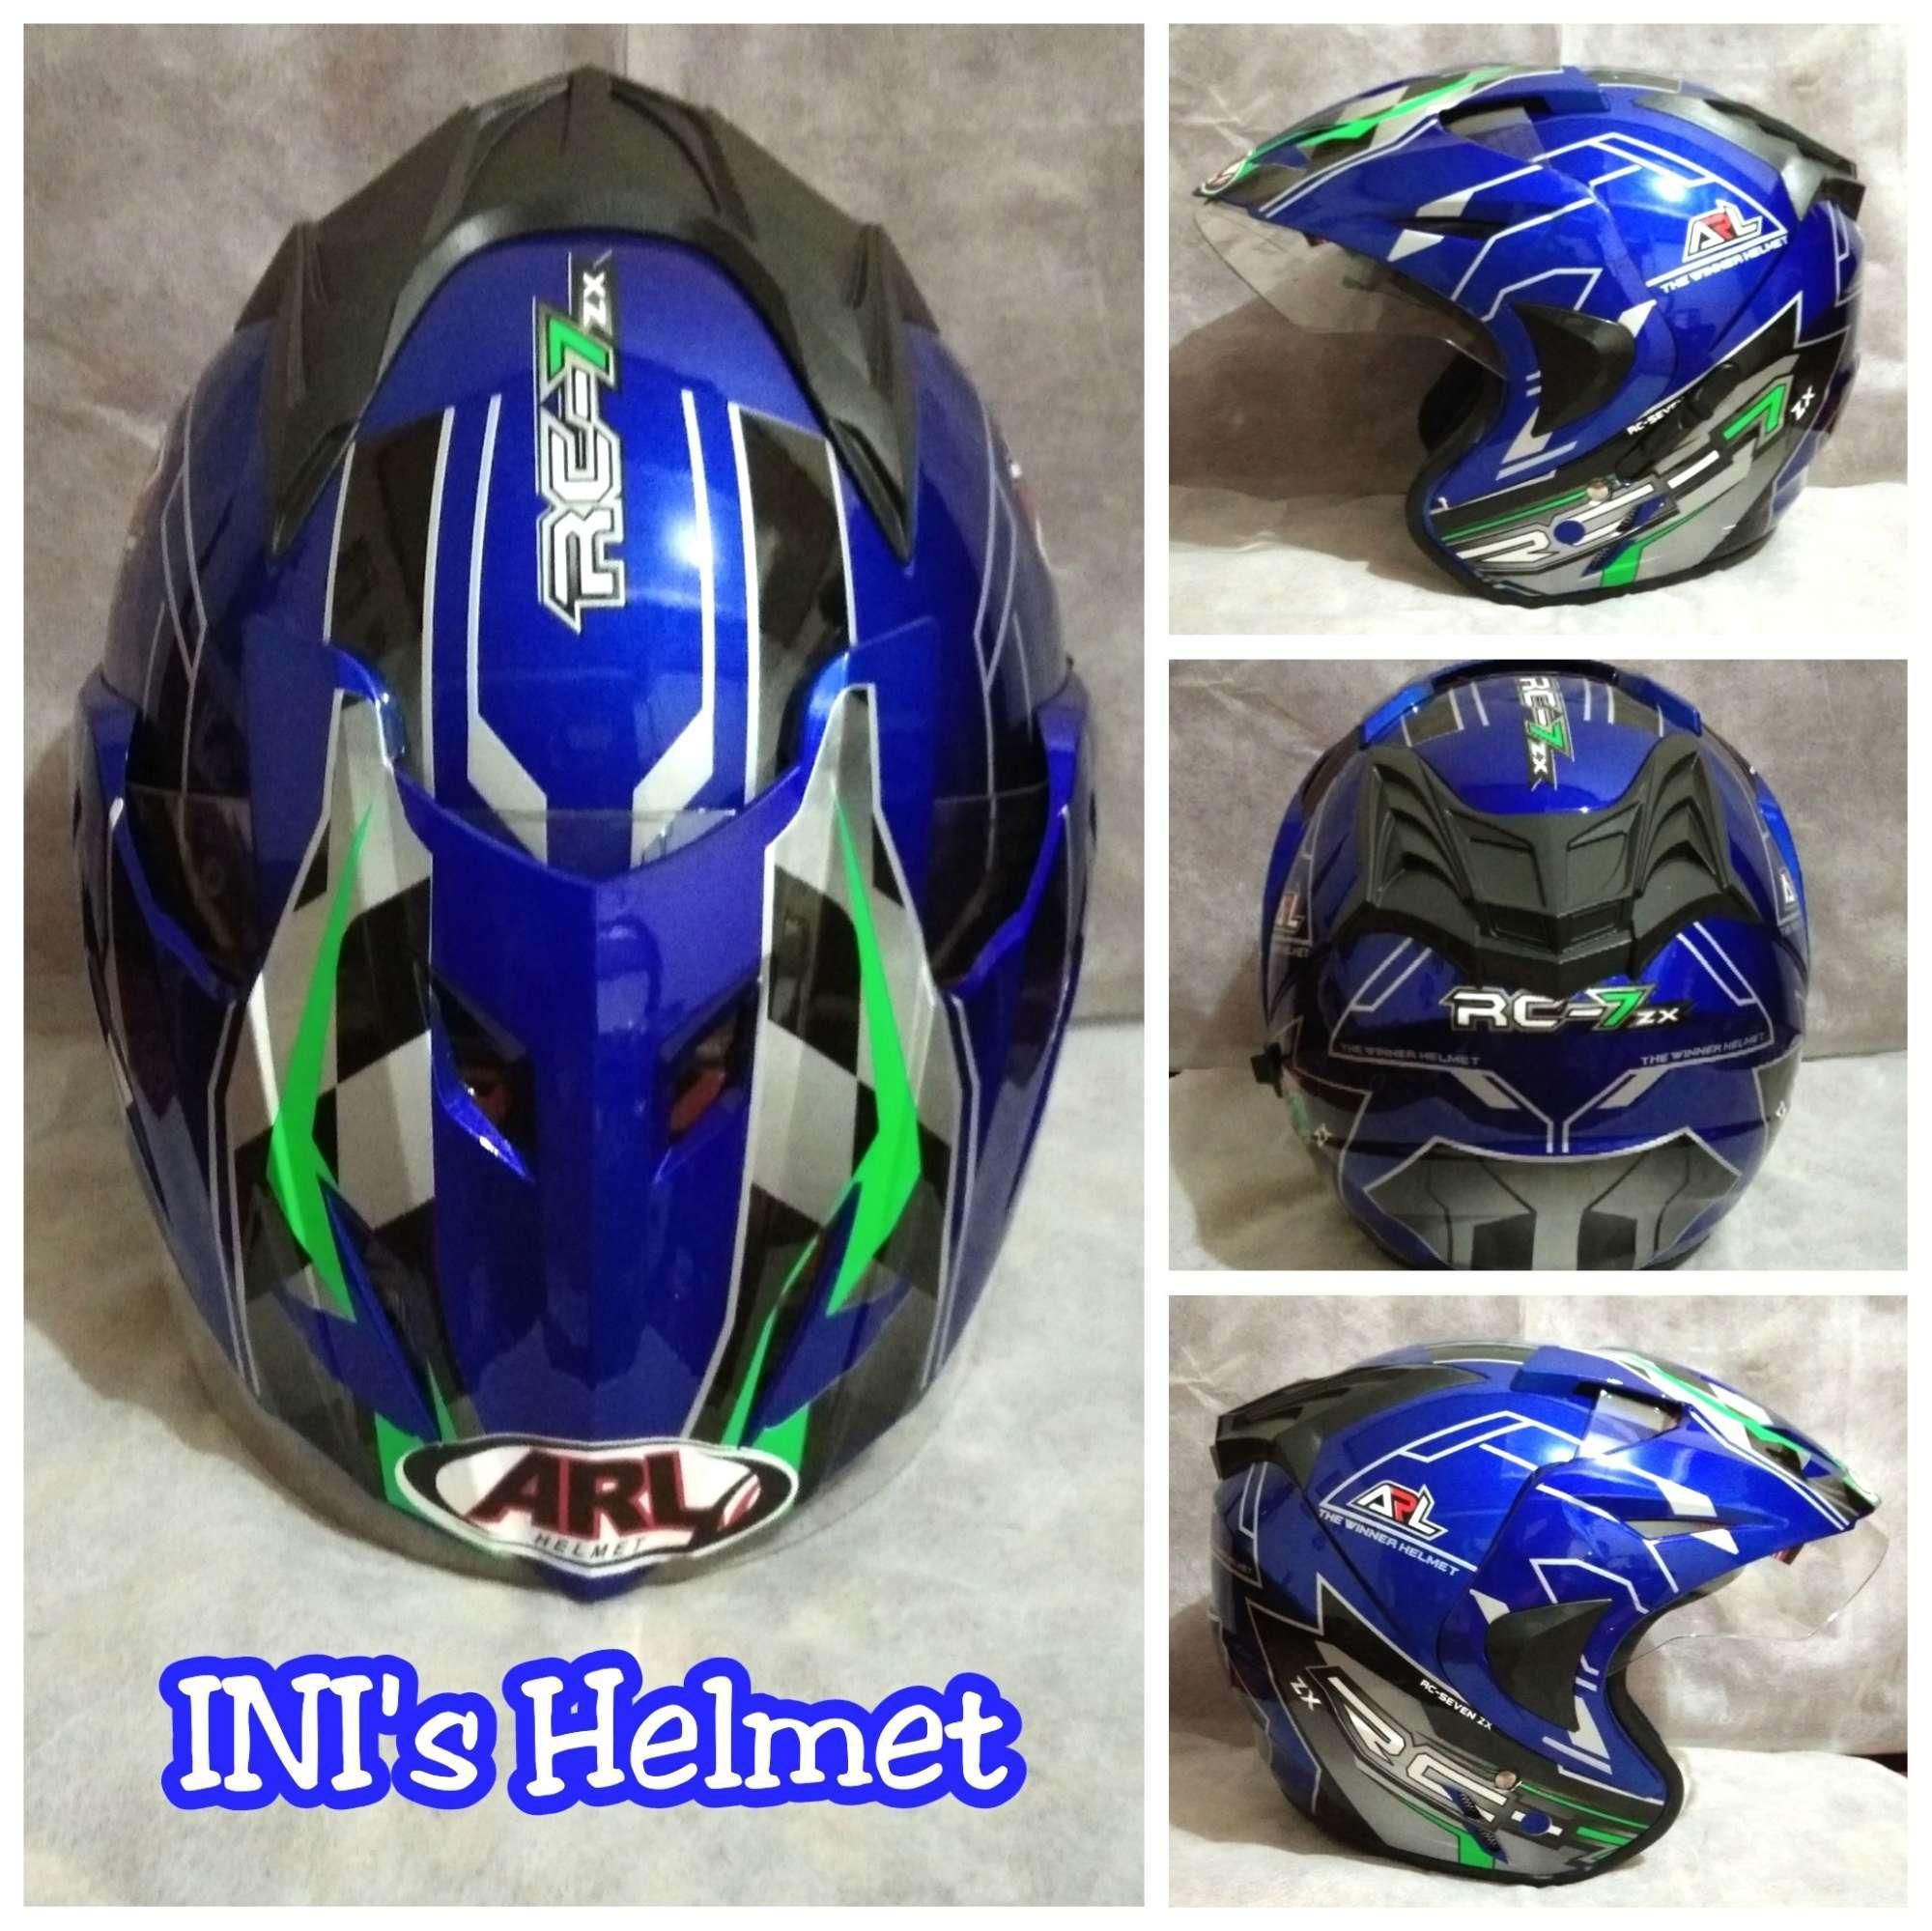 HOT PROMO ! Helm ARL Pet Dewasa Double Visor Murah Motif RC7 Biru - SNI - INIs Mart Jakarta